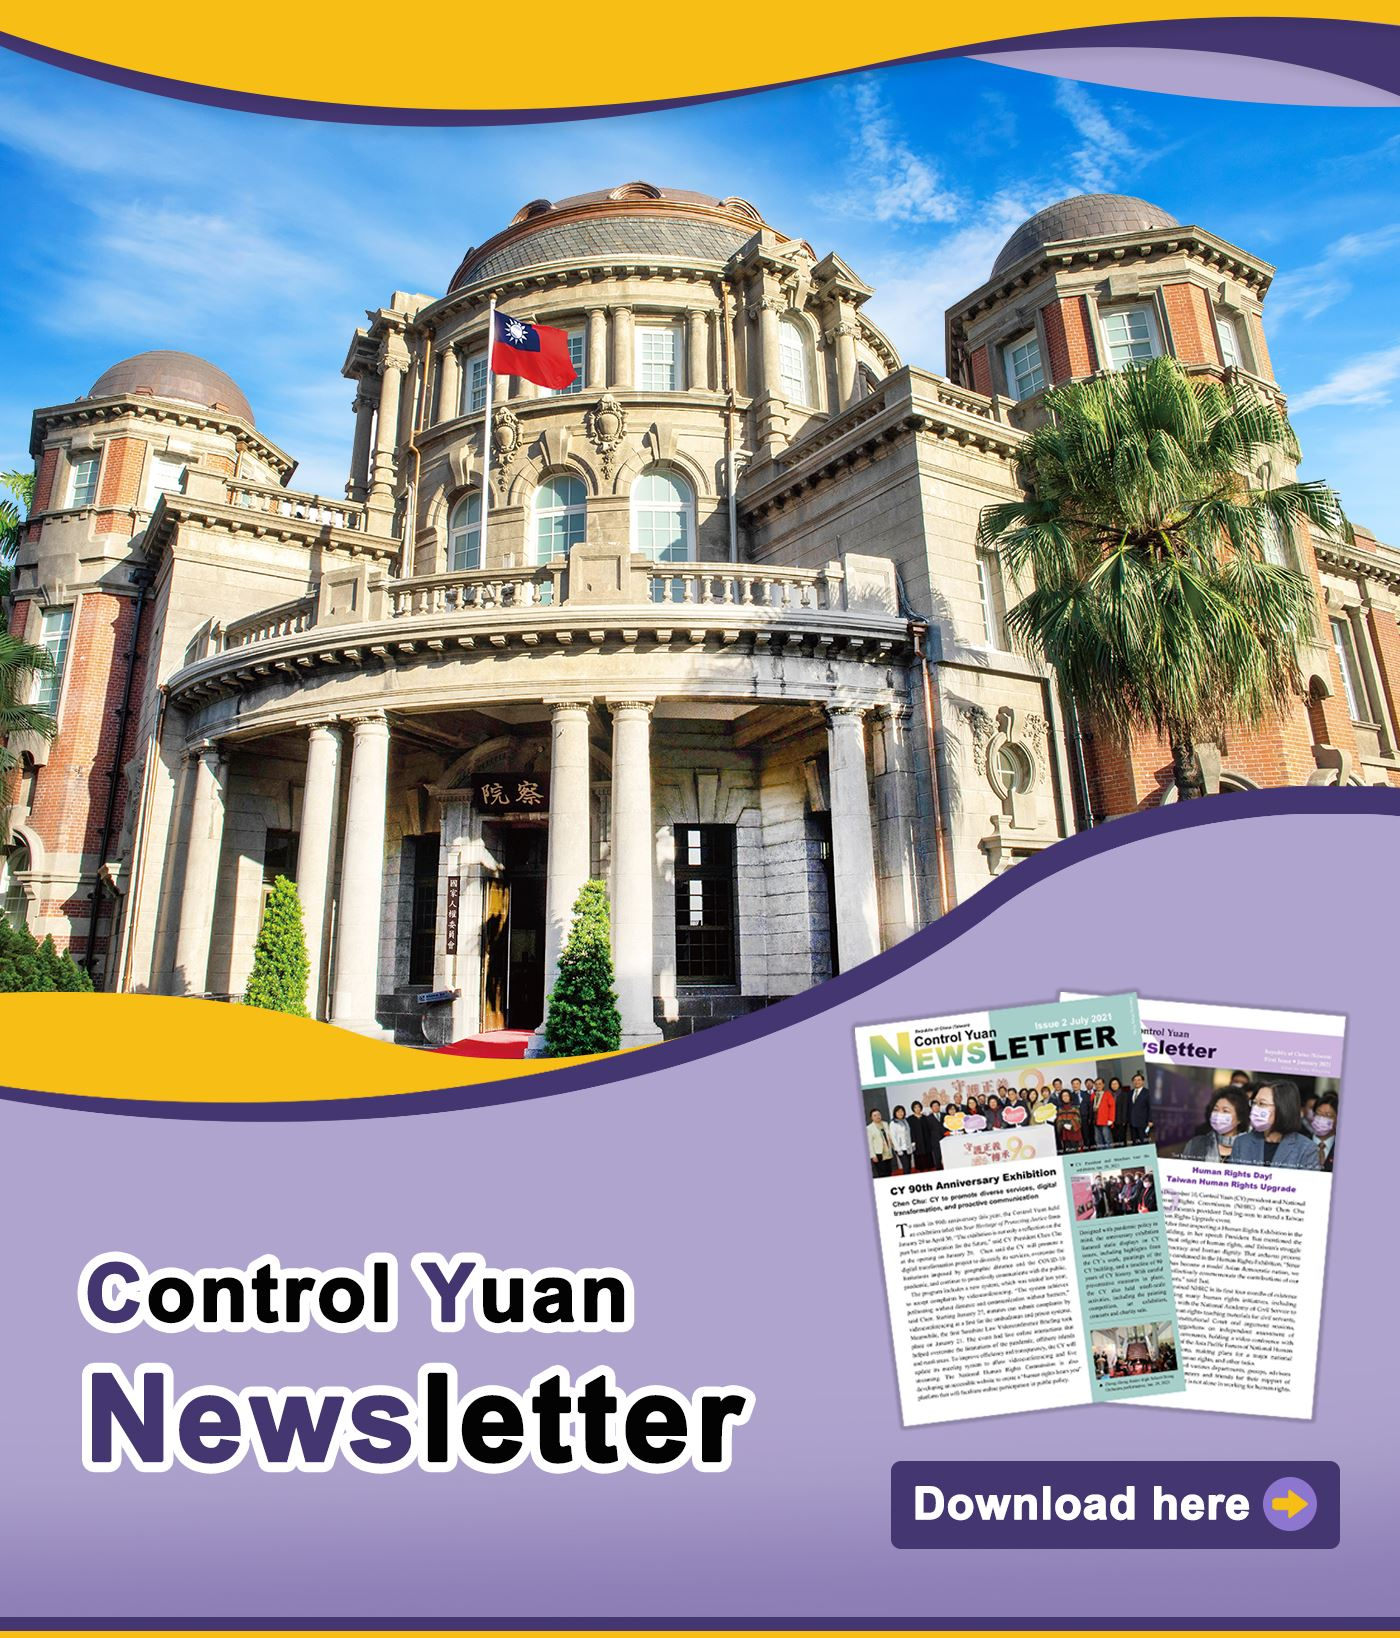 Control Yuan Newsletter